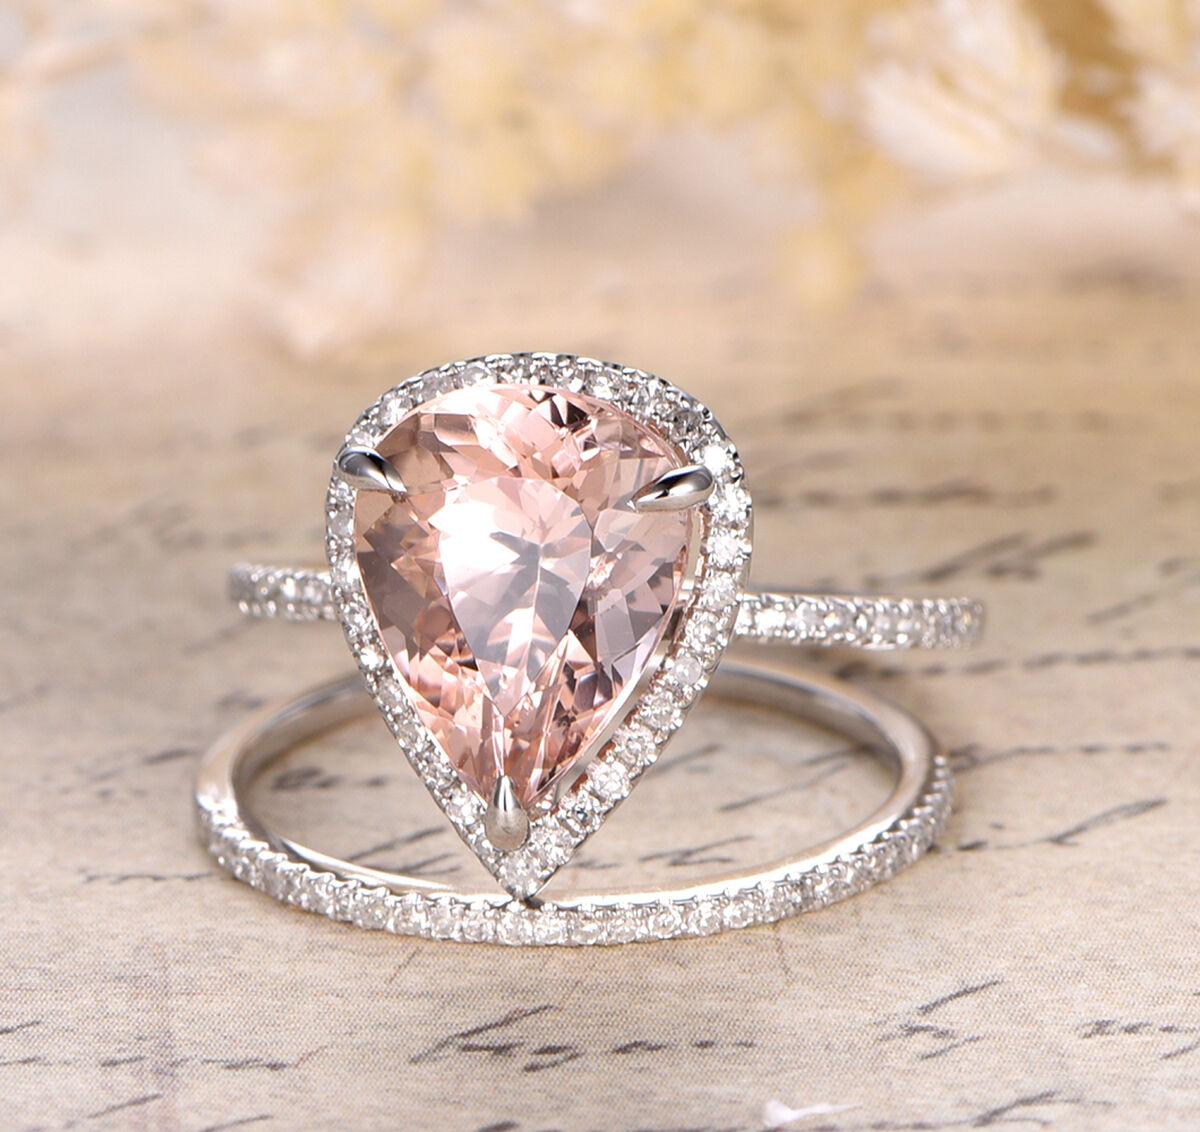 Claw Prongs 8x12mm Pear Cut Morganite Halo Diamonds Trio Ring Set 14K White gold